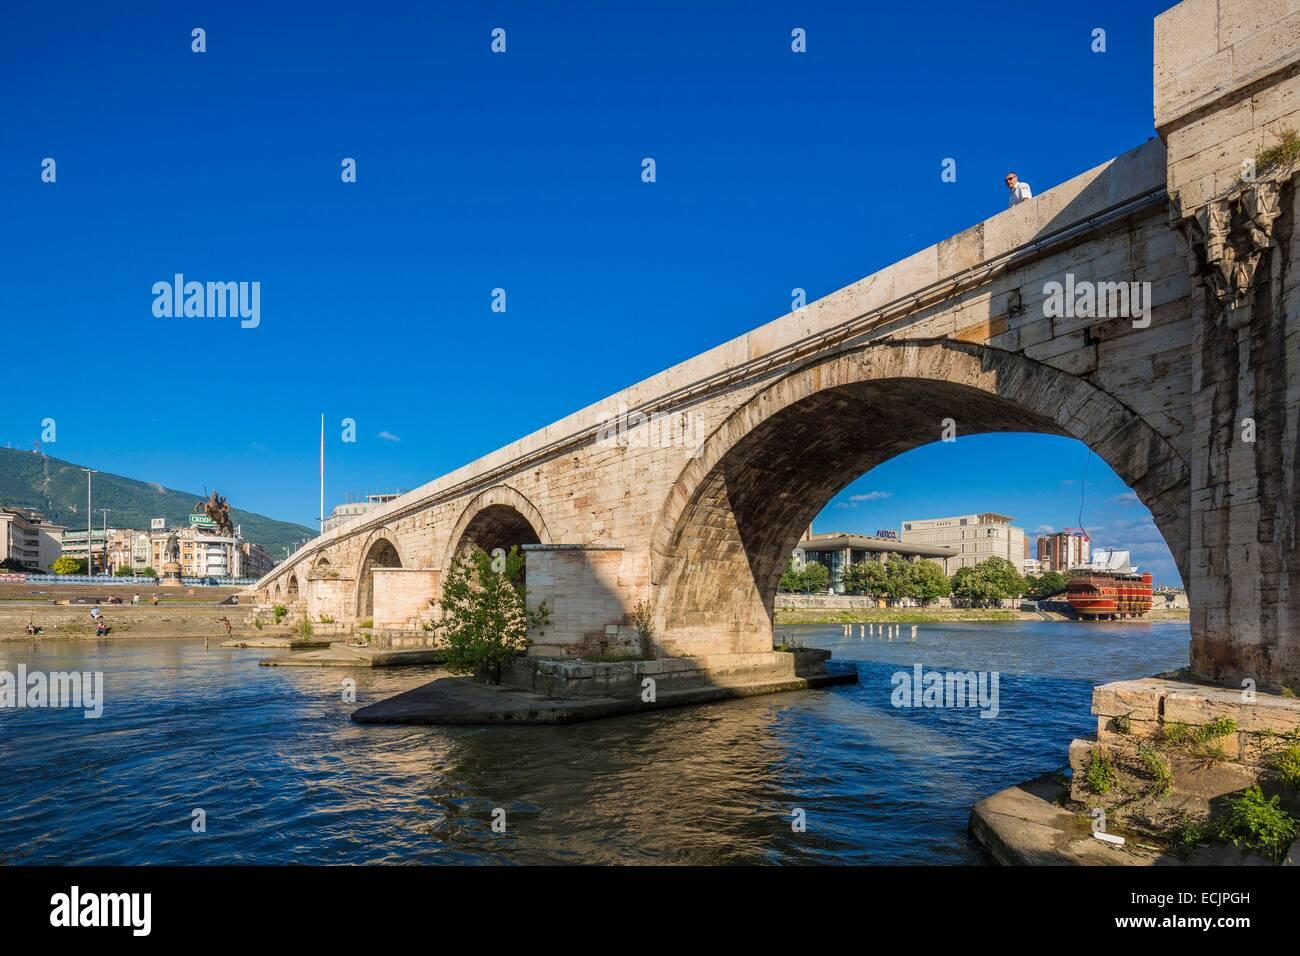 Republic of Macedonia, Skopje, city center, the Stone Bridge - Stock Image